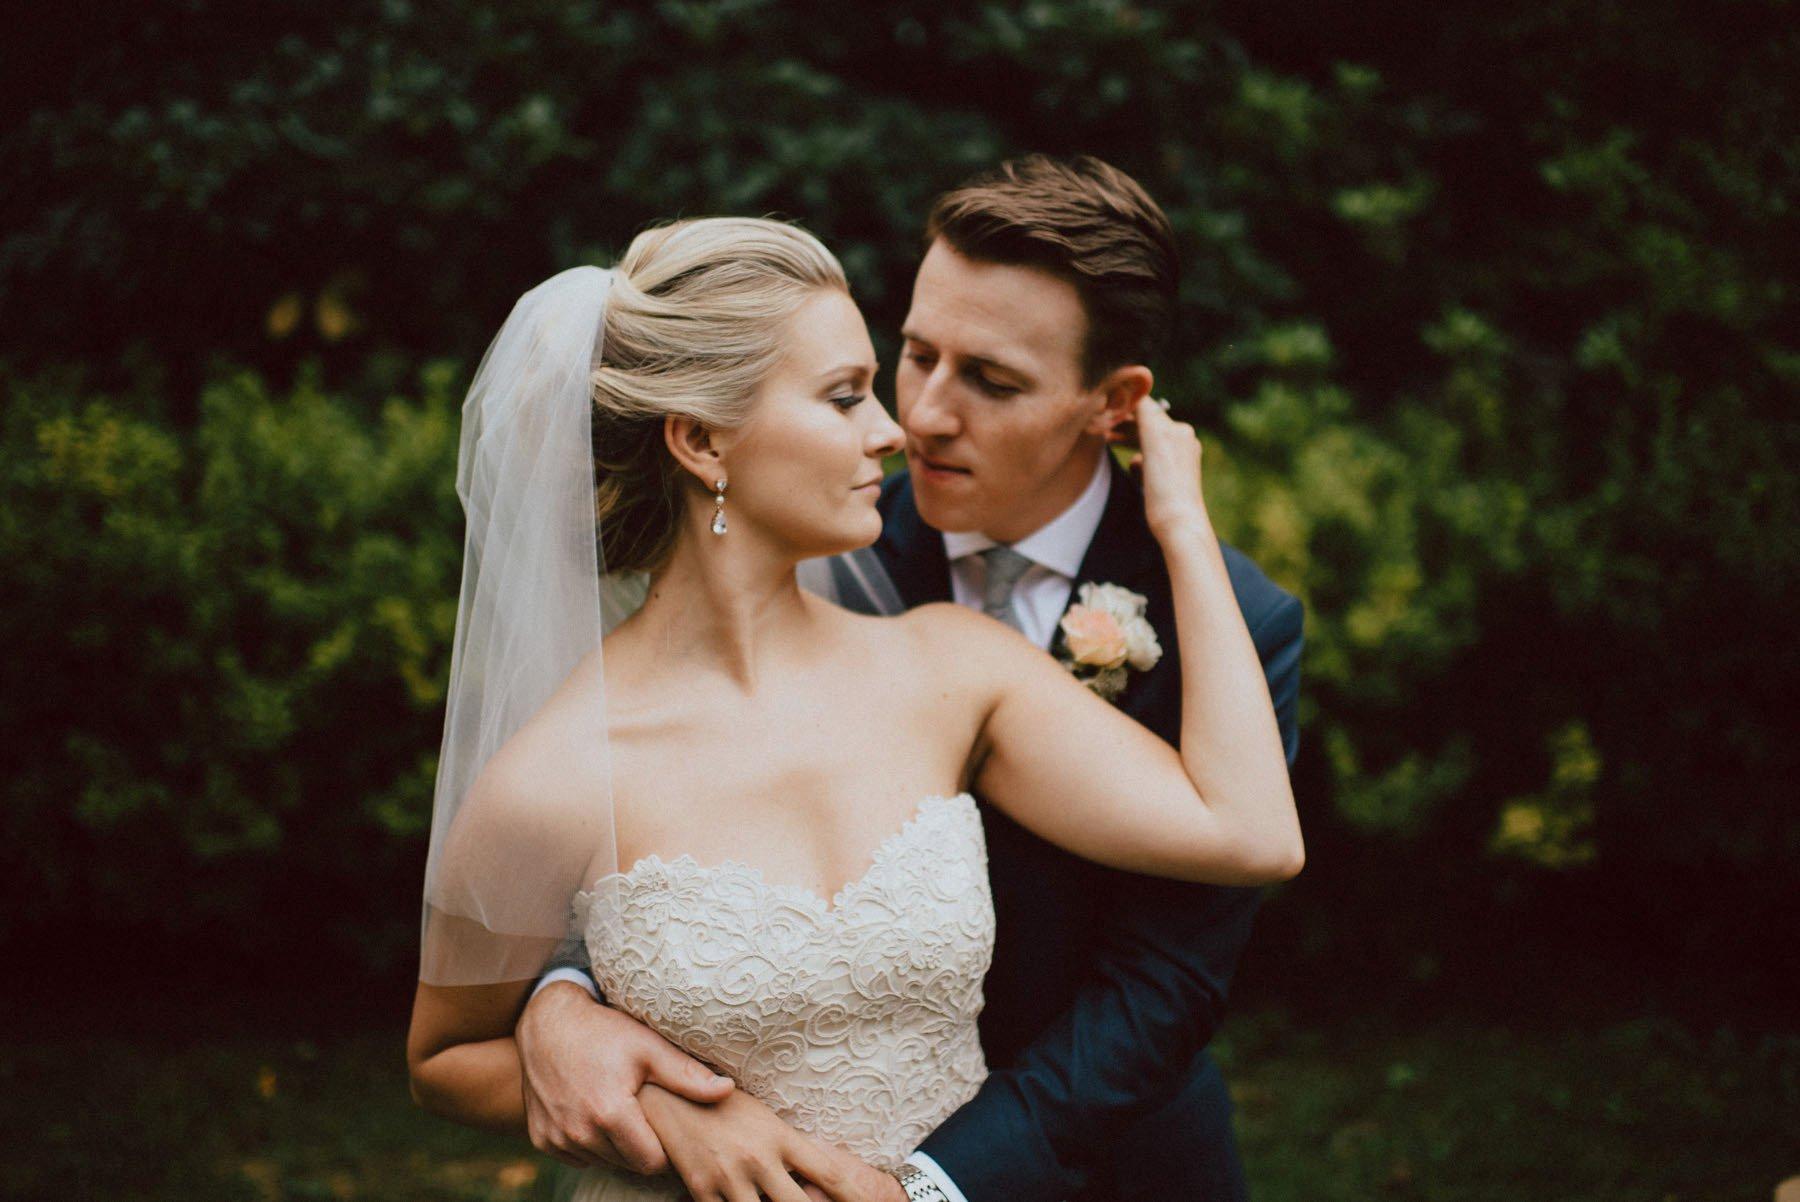 greenville-country-club-wedding-90.jpg